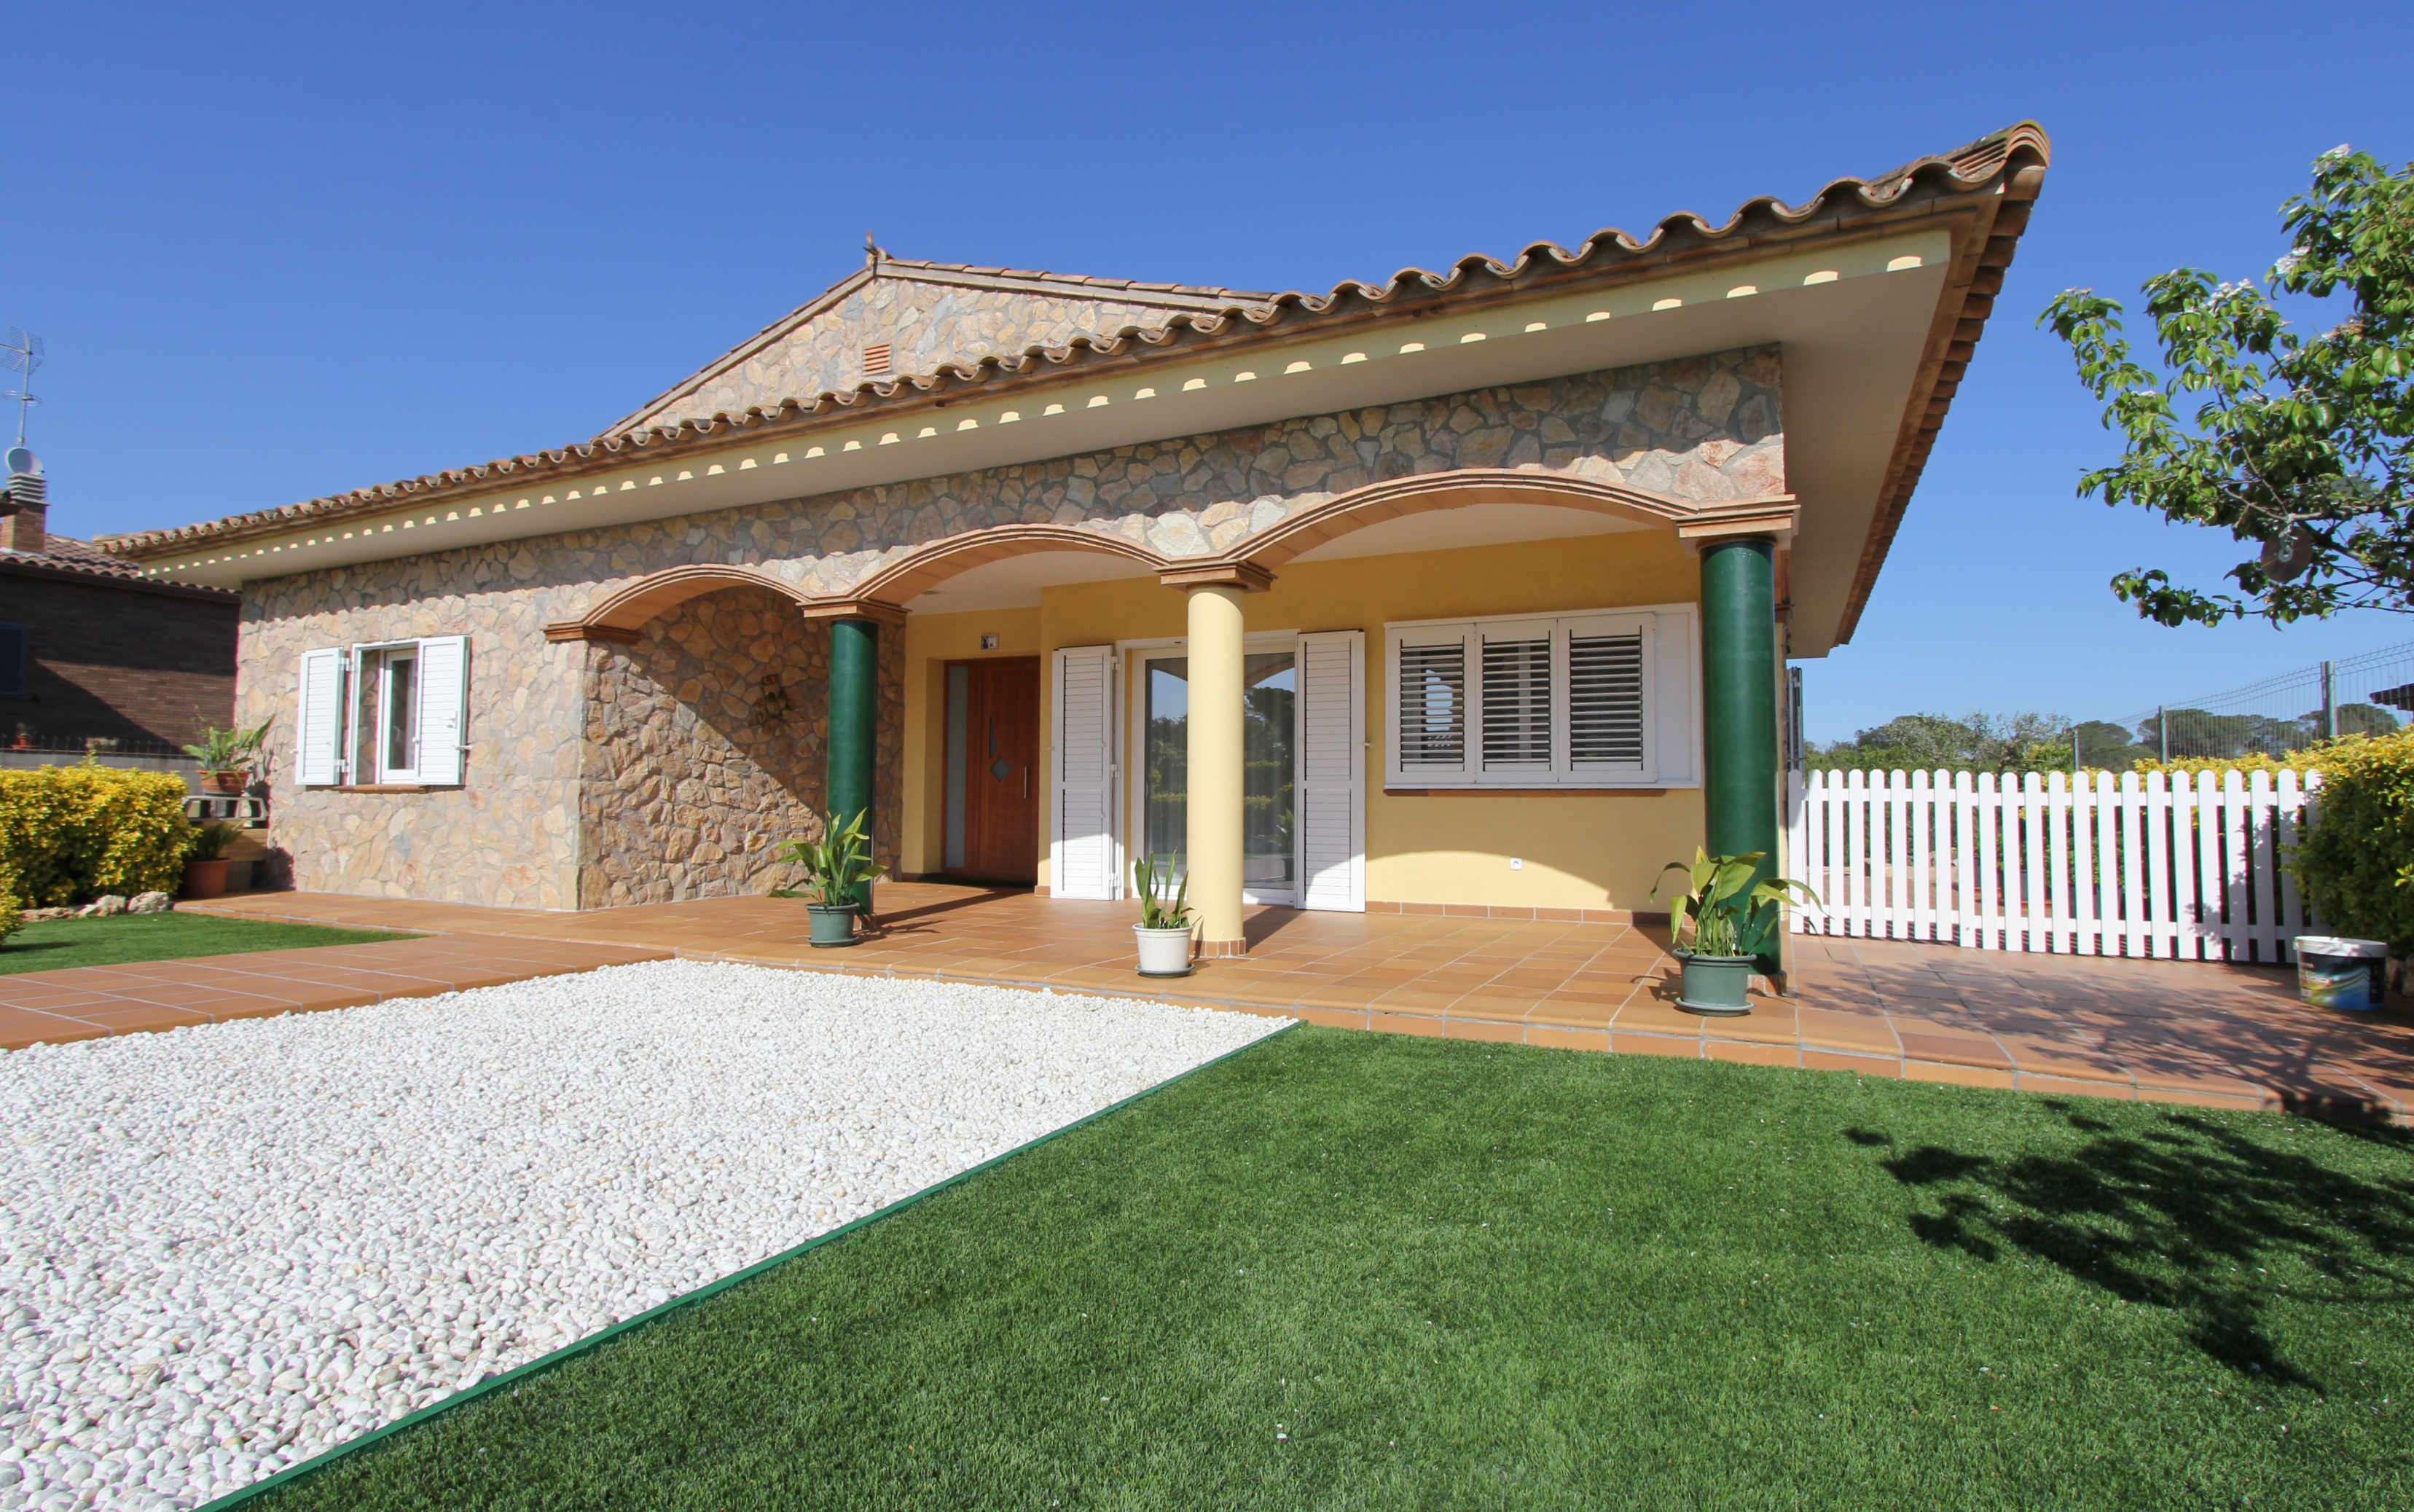 Casa nueva a estrenar en Vidreres, Girona